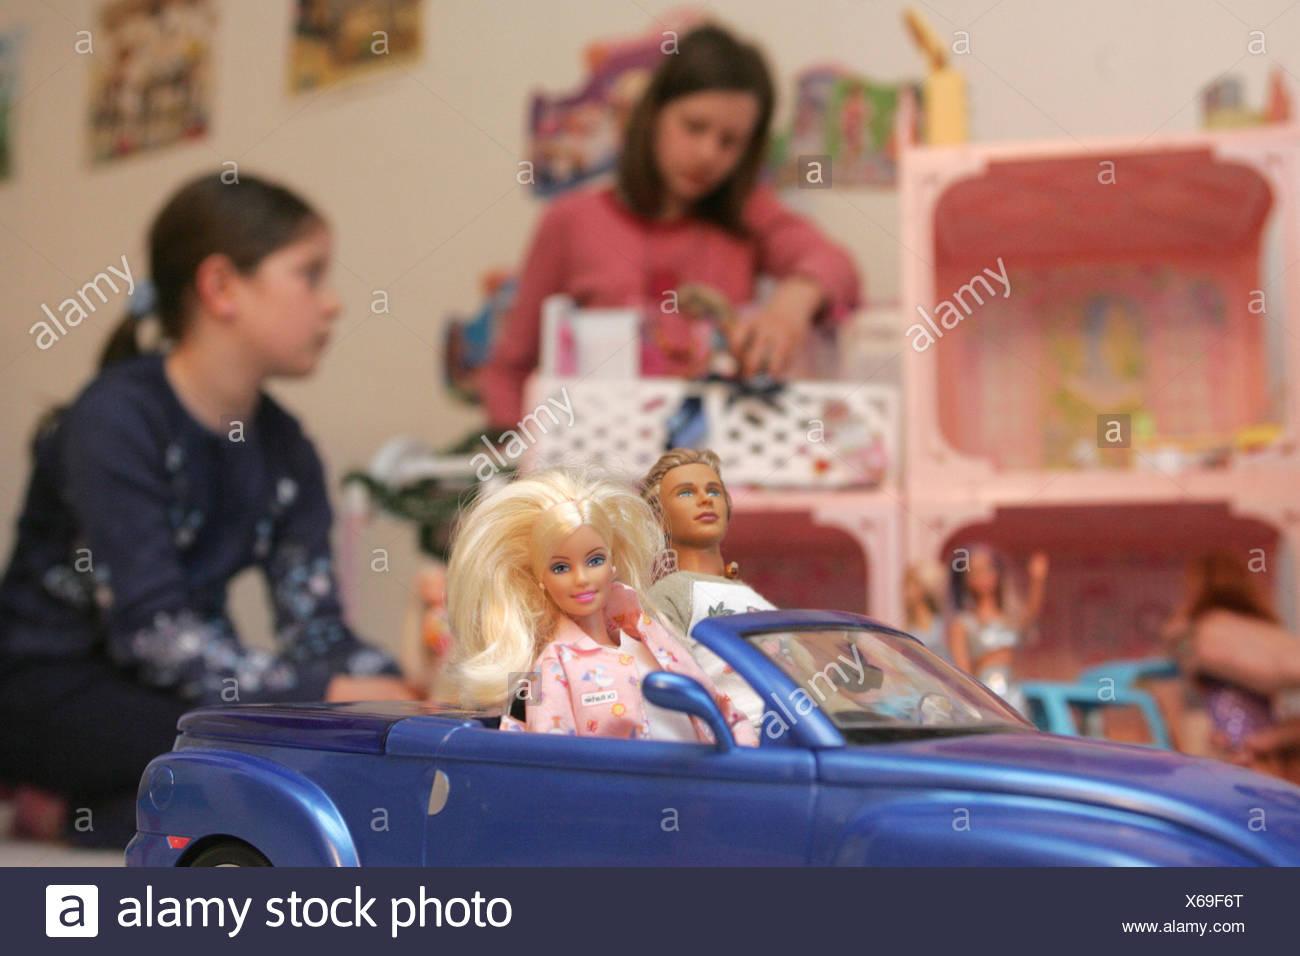 08.04.2005, DEU, Marlena (11) and Leonie (8) play with Barbie dolls - Stock Image